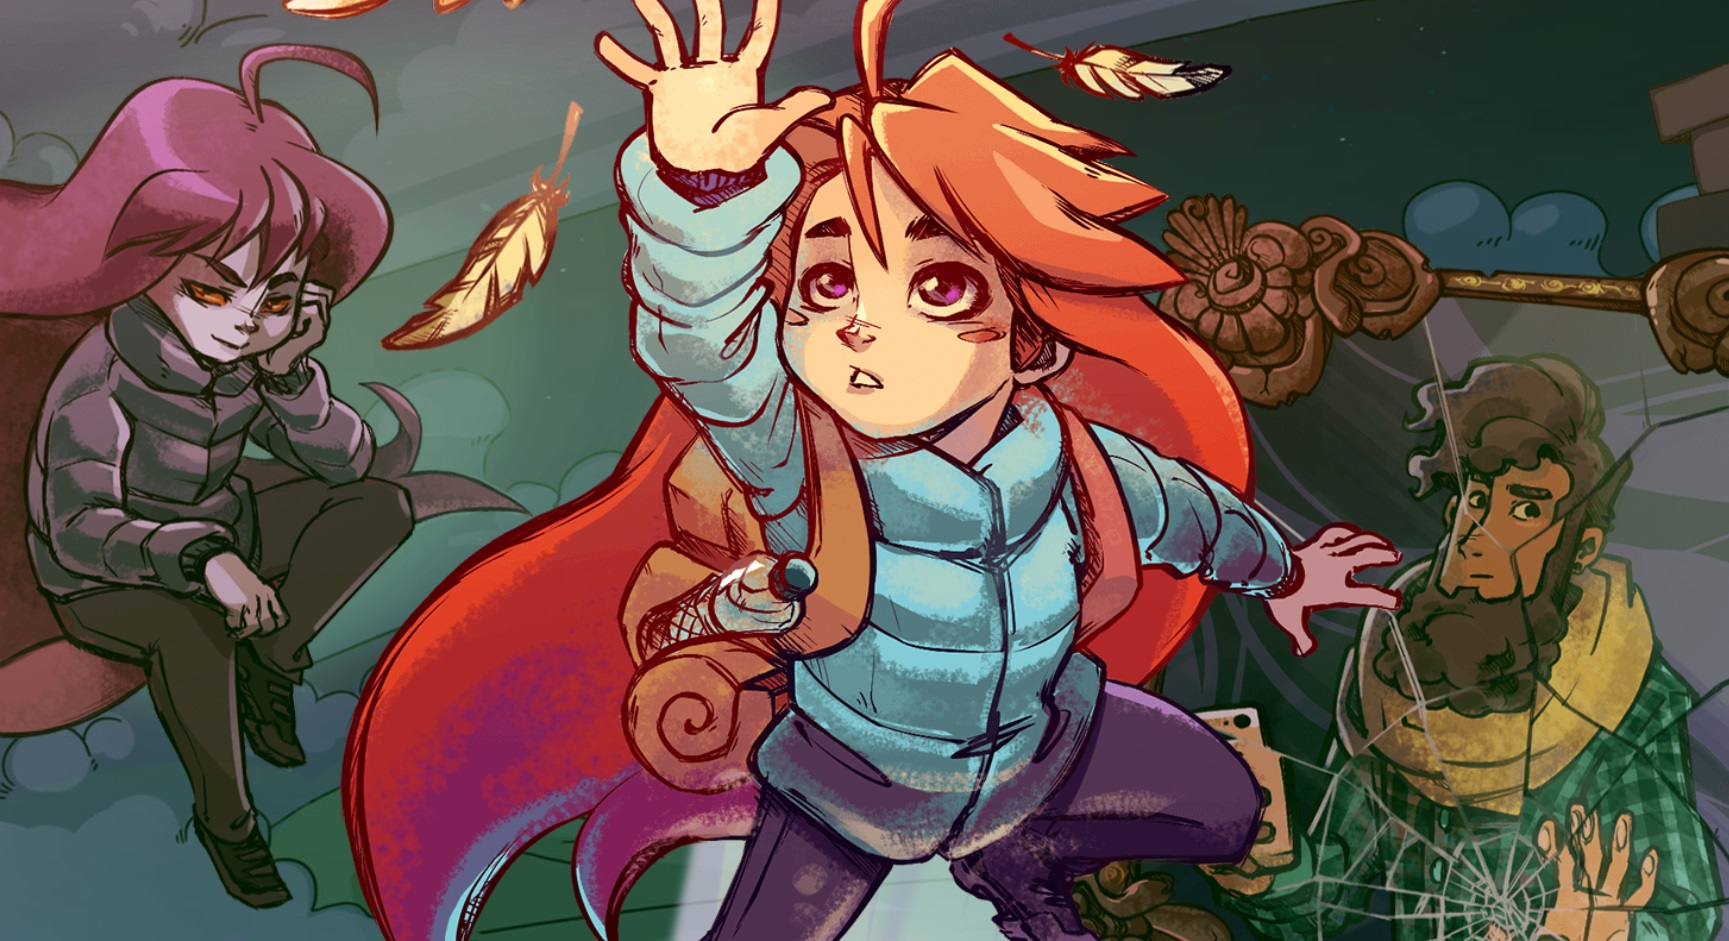 Celeste's Madeline is 2018's best new gaming character   VentureBeat